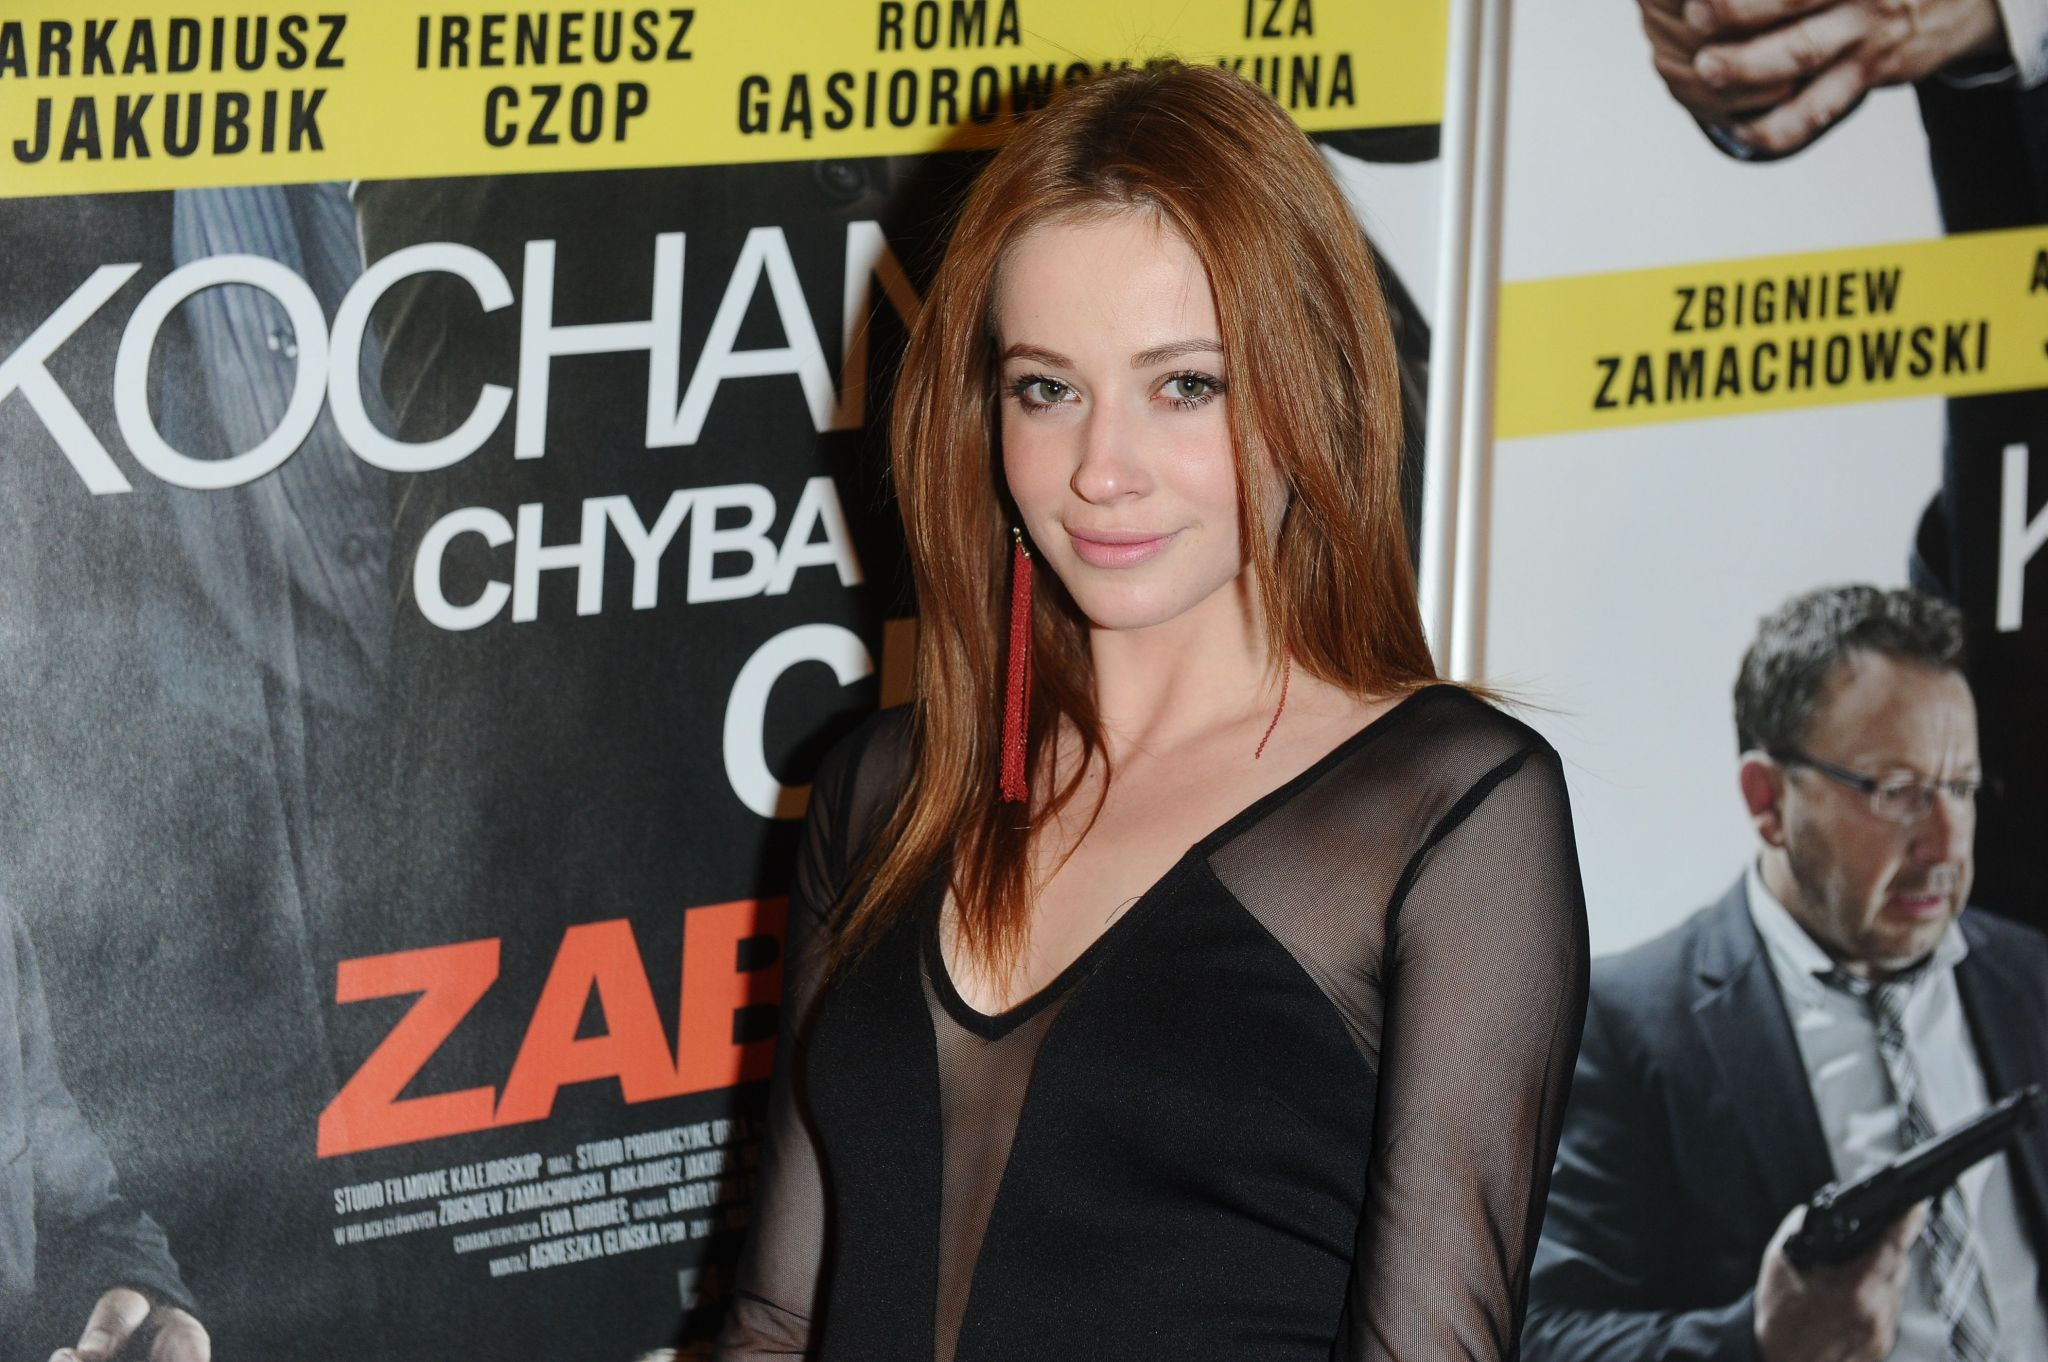 Magda Swat